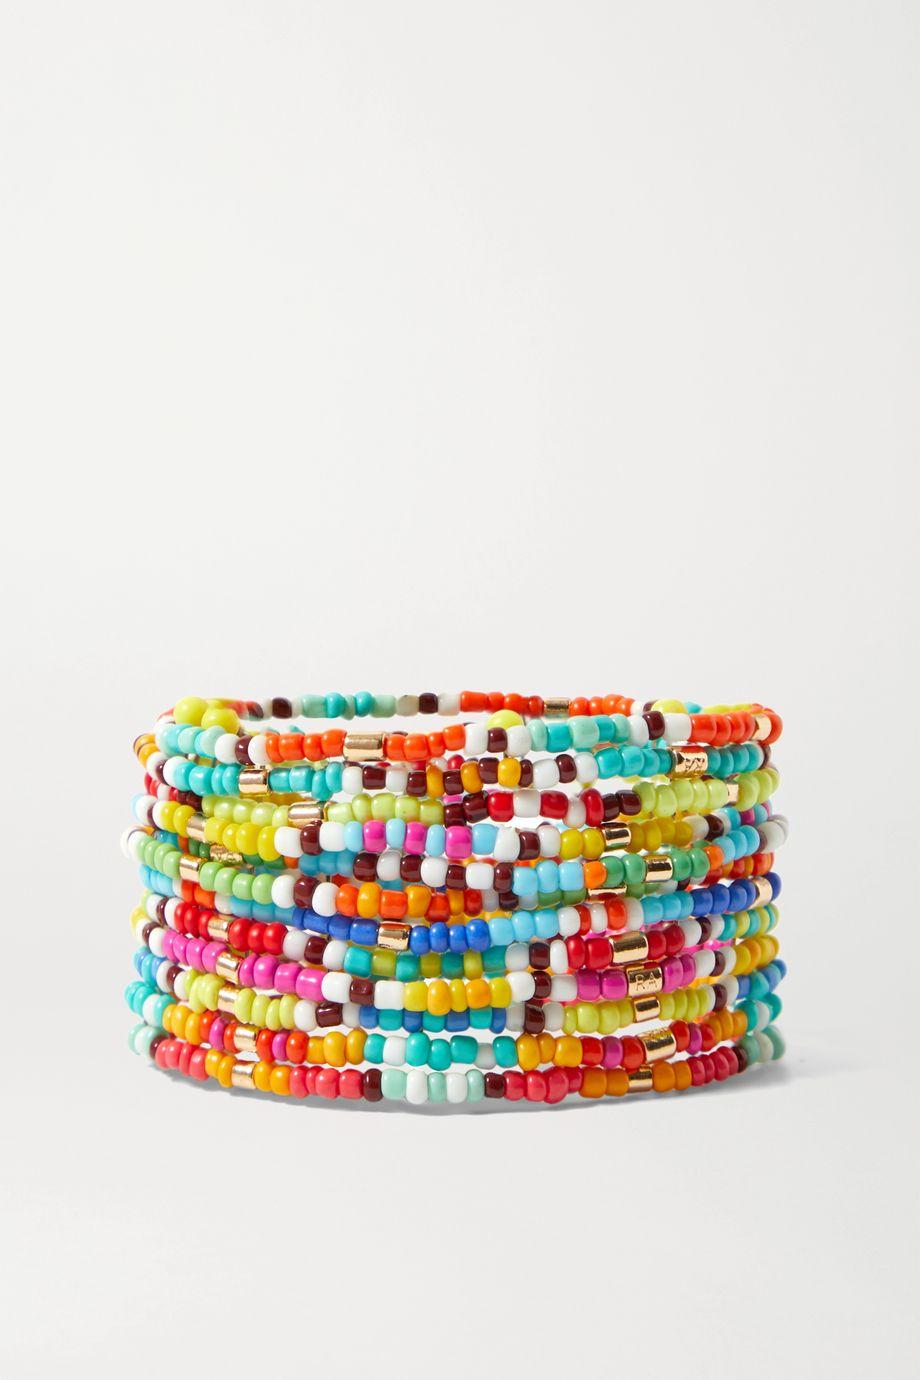 Roxanne Assoulin Set de 12 bracelets en perles New Patchwork